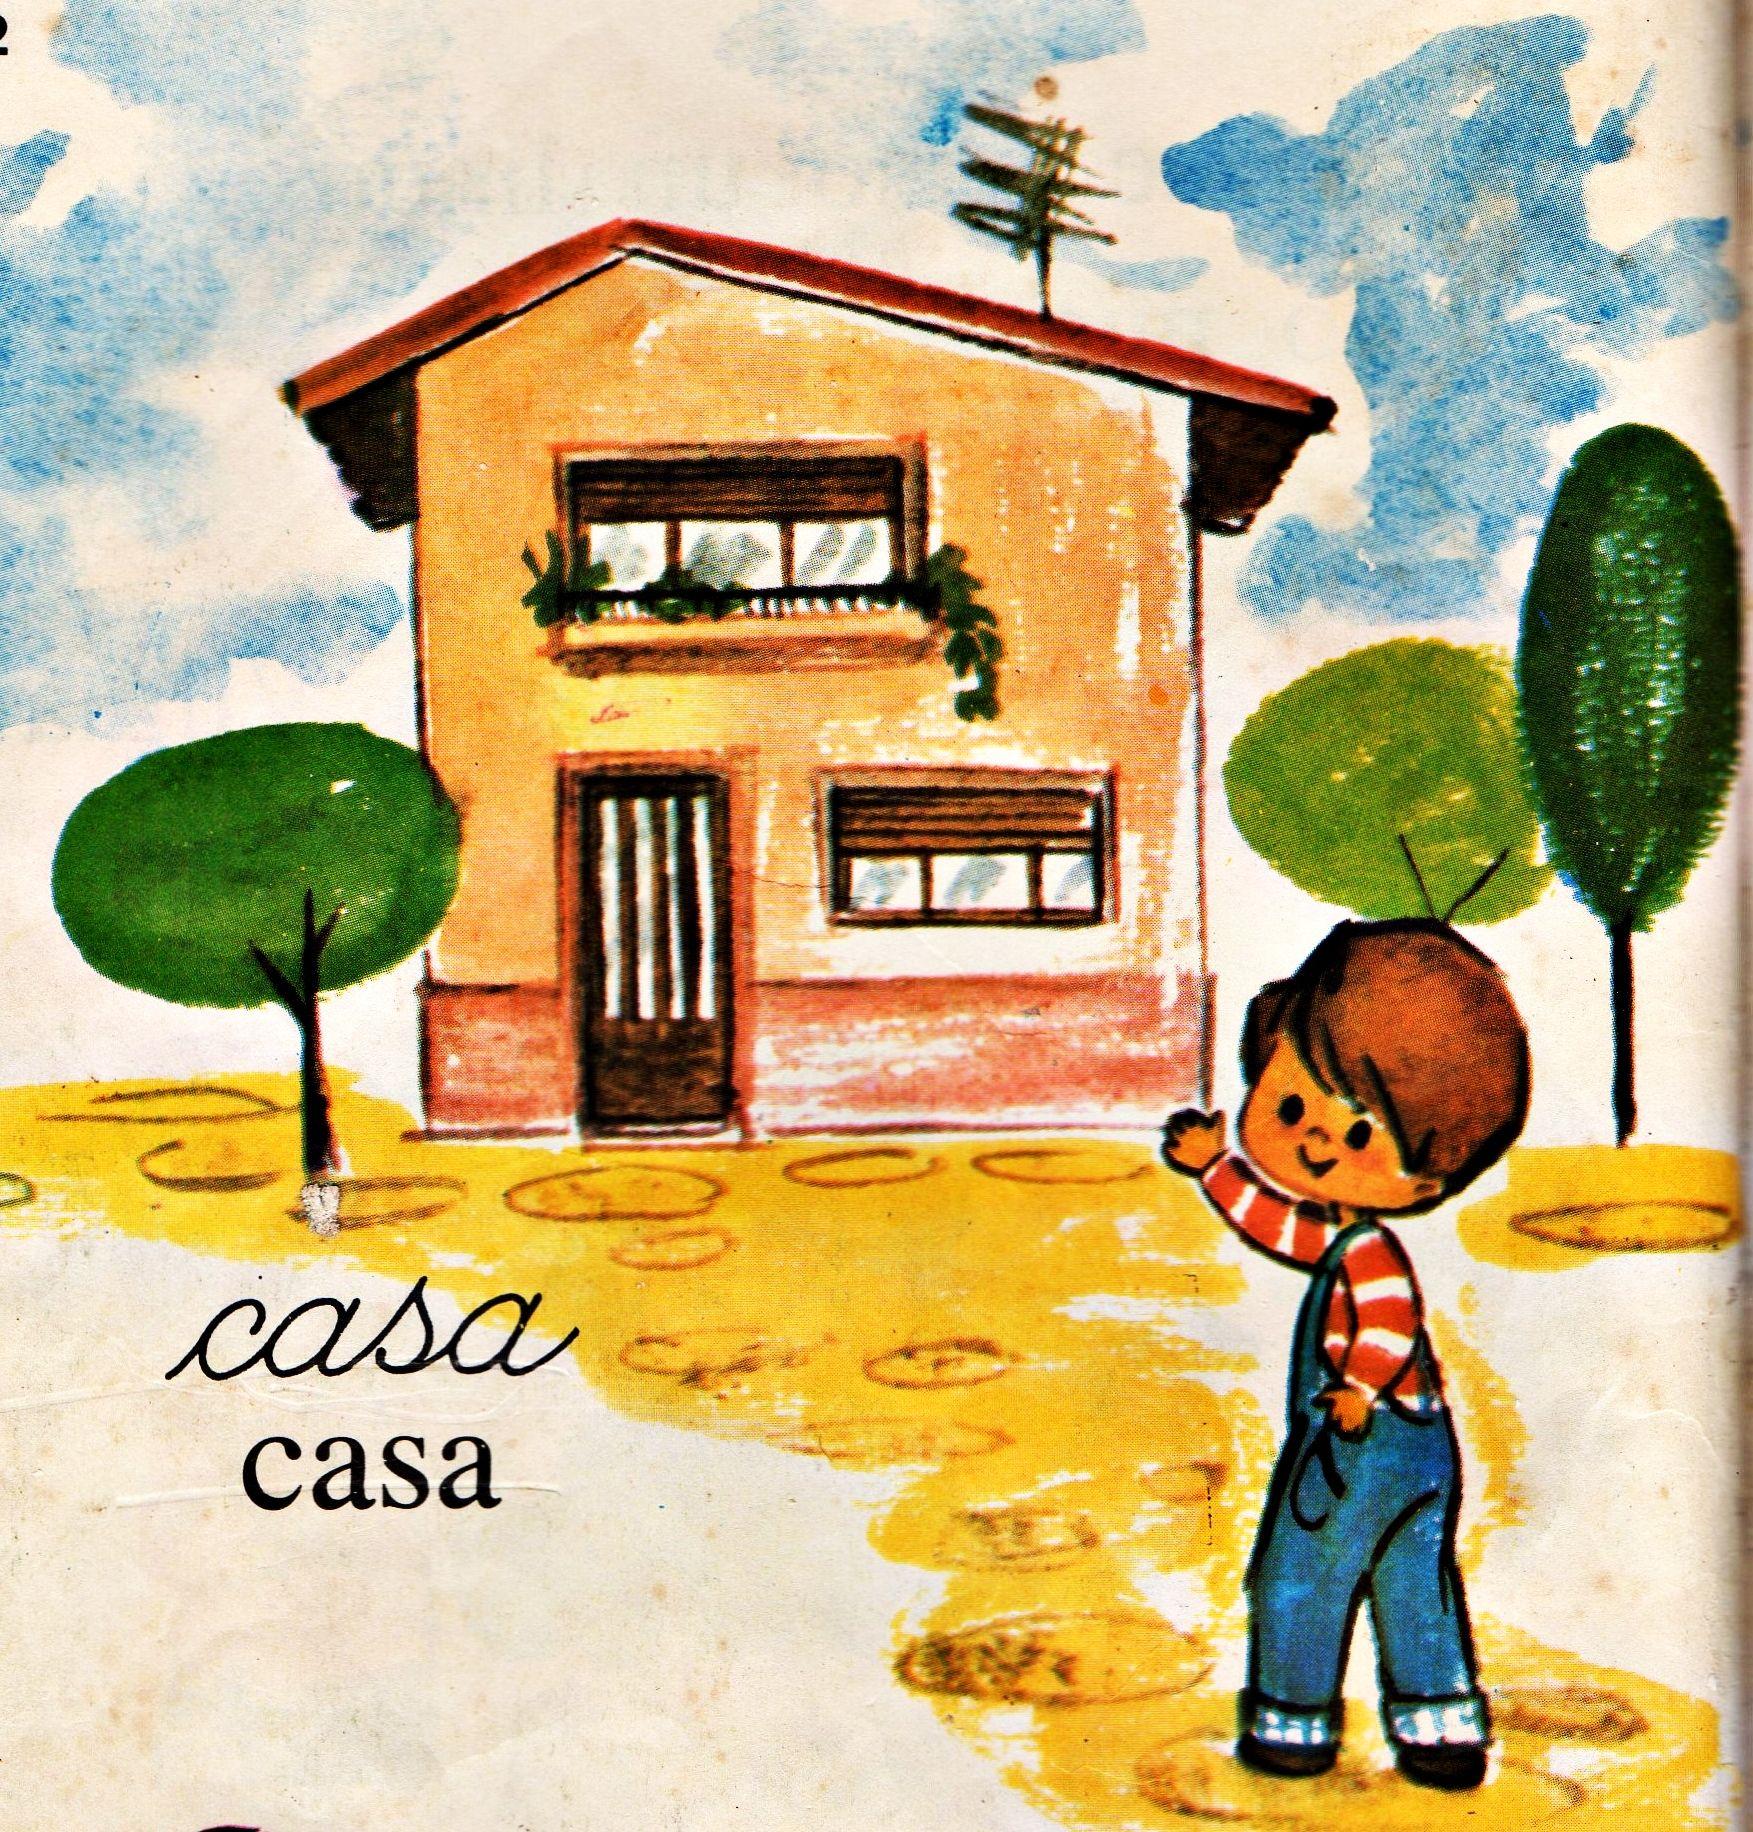 Libro de lectura de primer grado,Gustavito,Argentina.